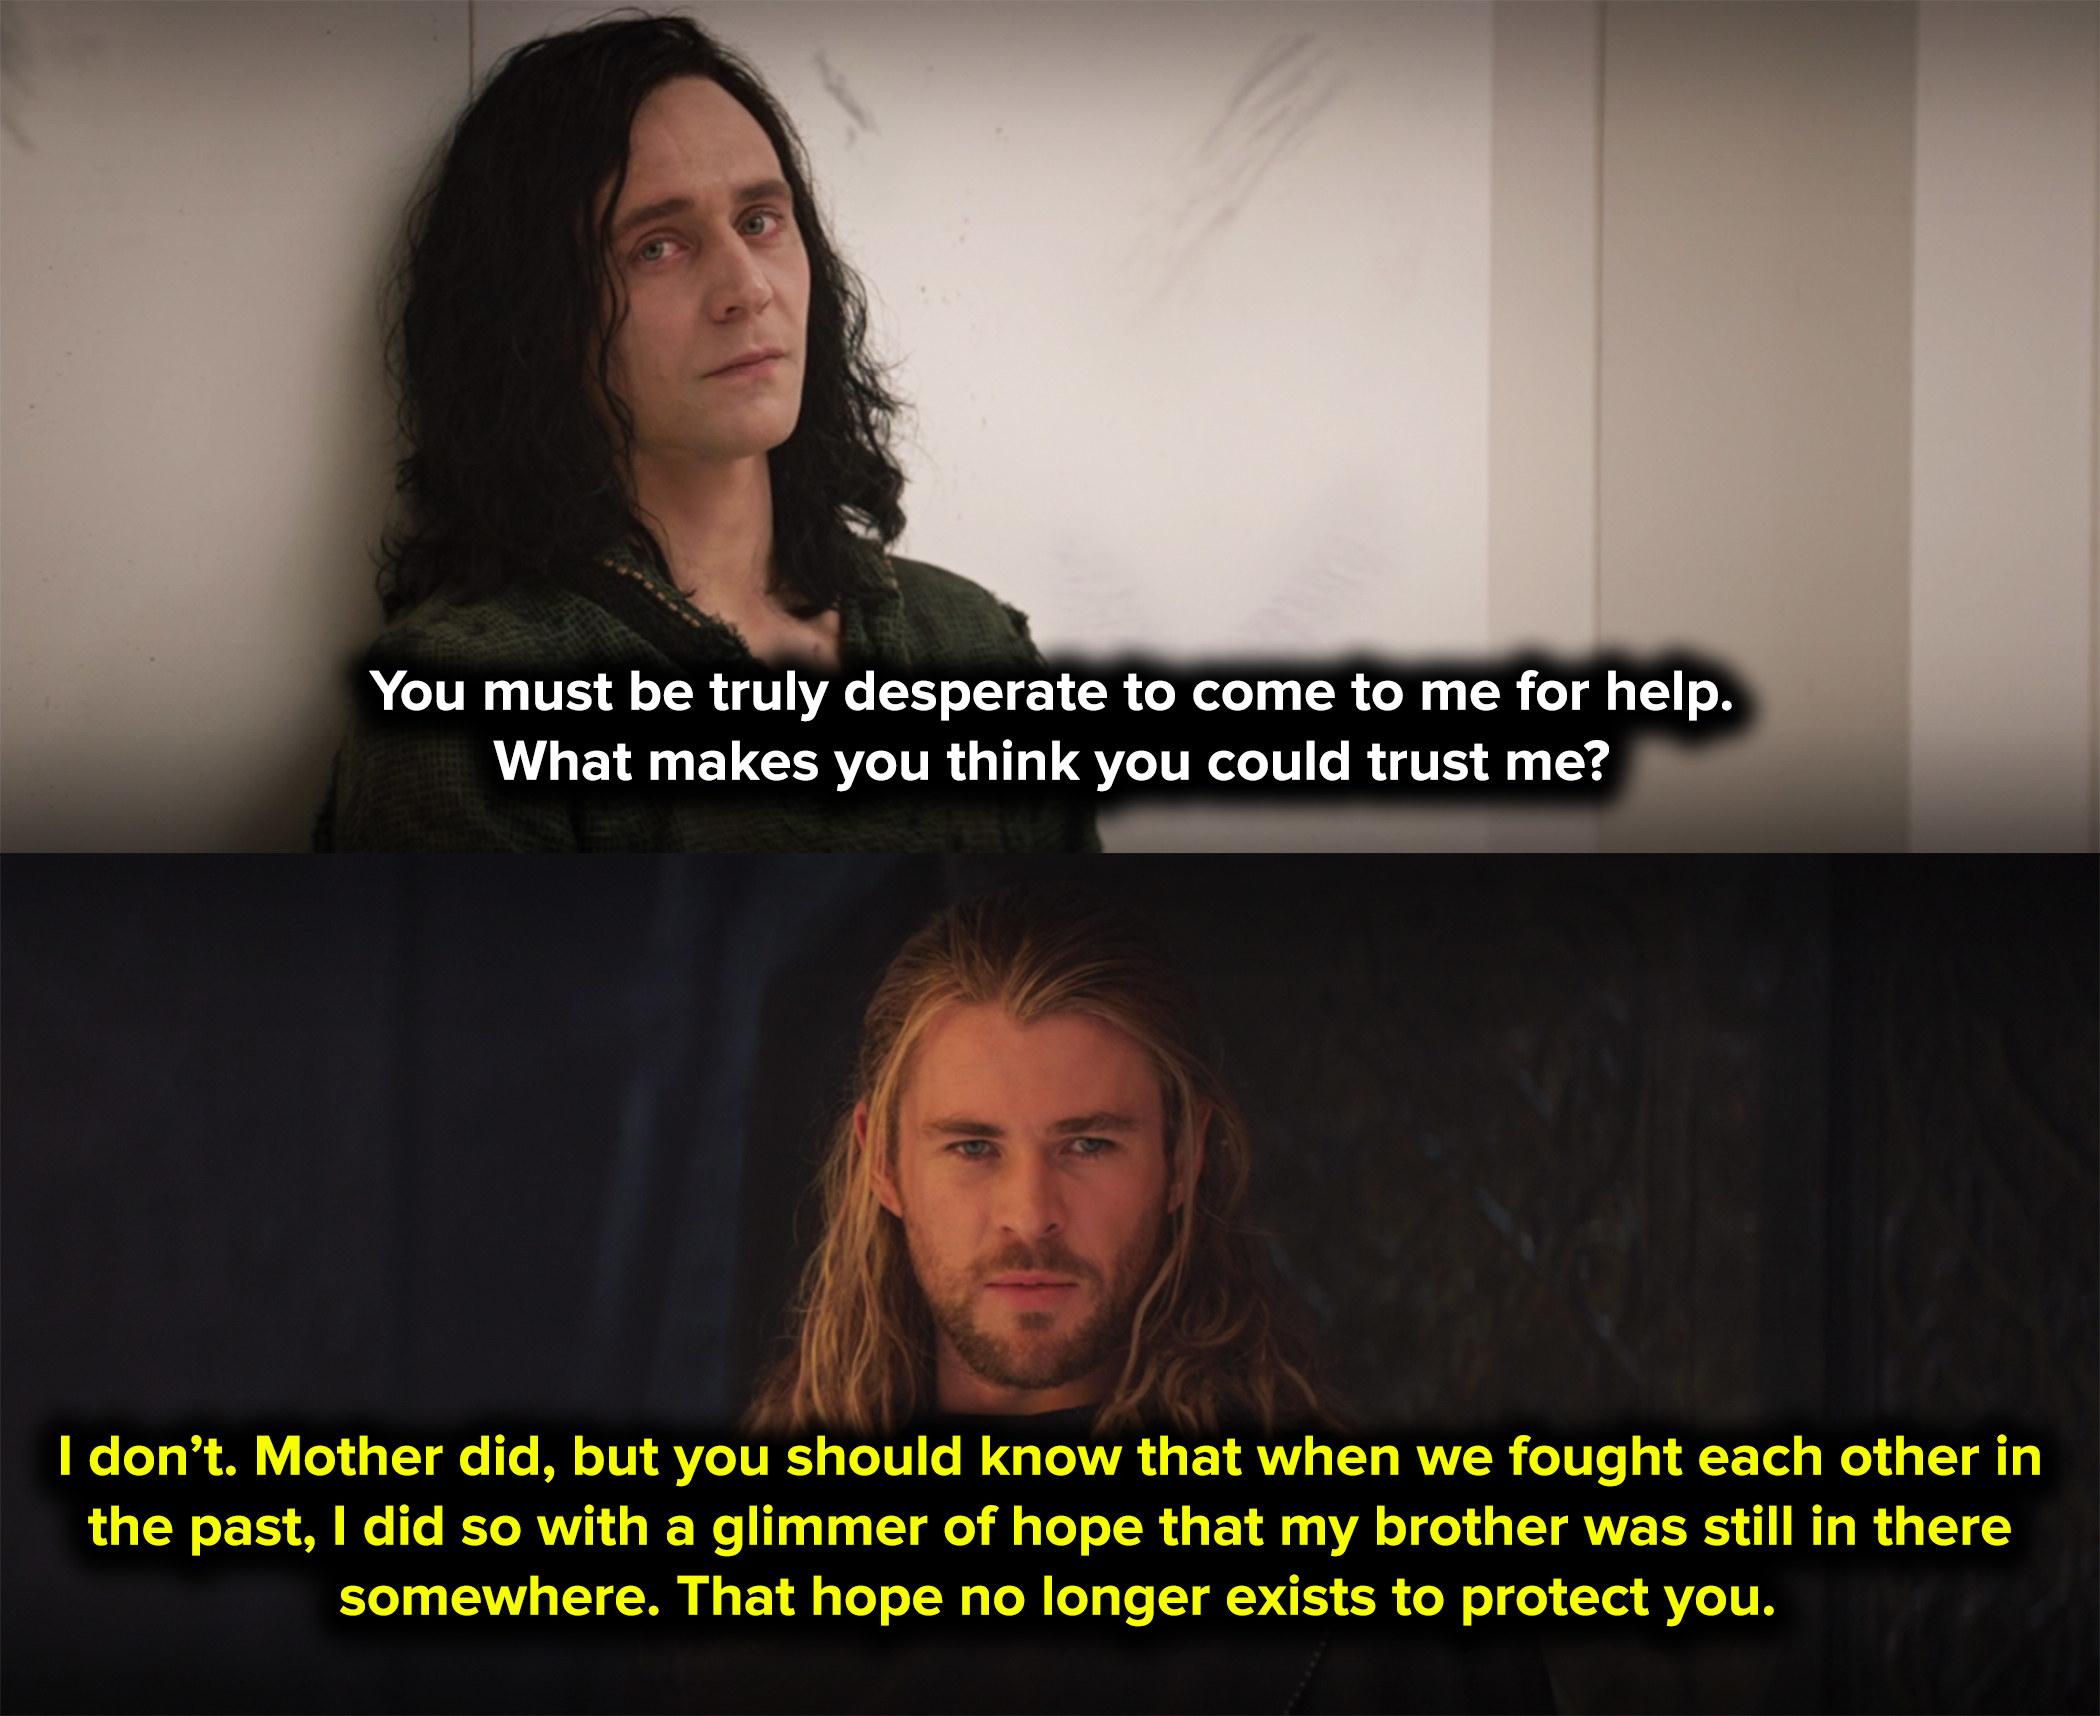 Thor tells Loki that he doesn't trust him, but Frigga did